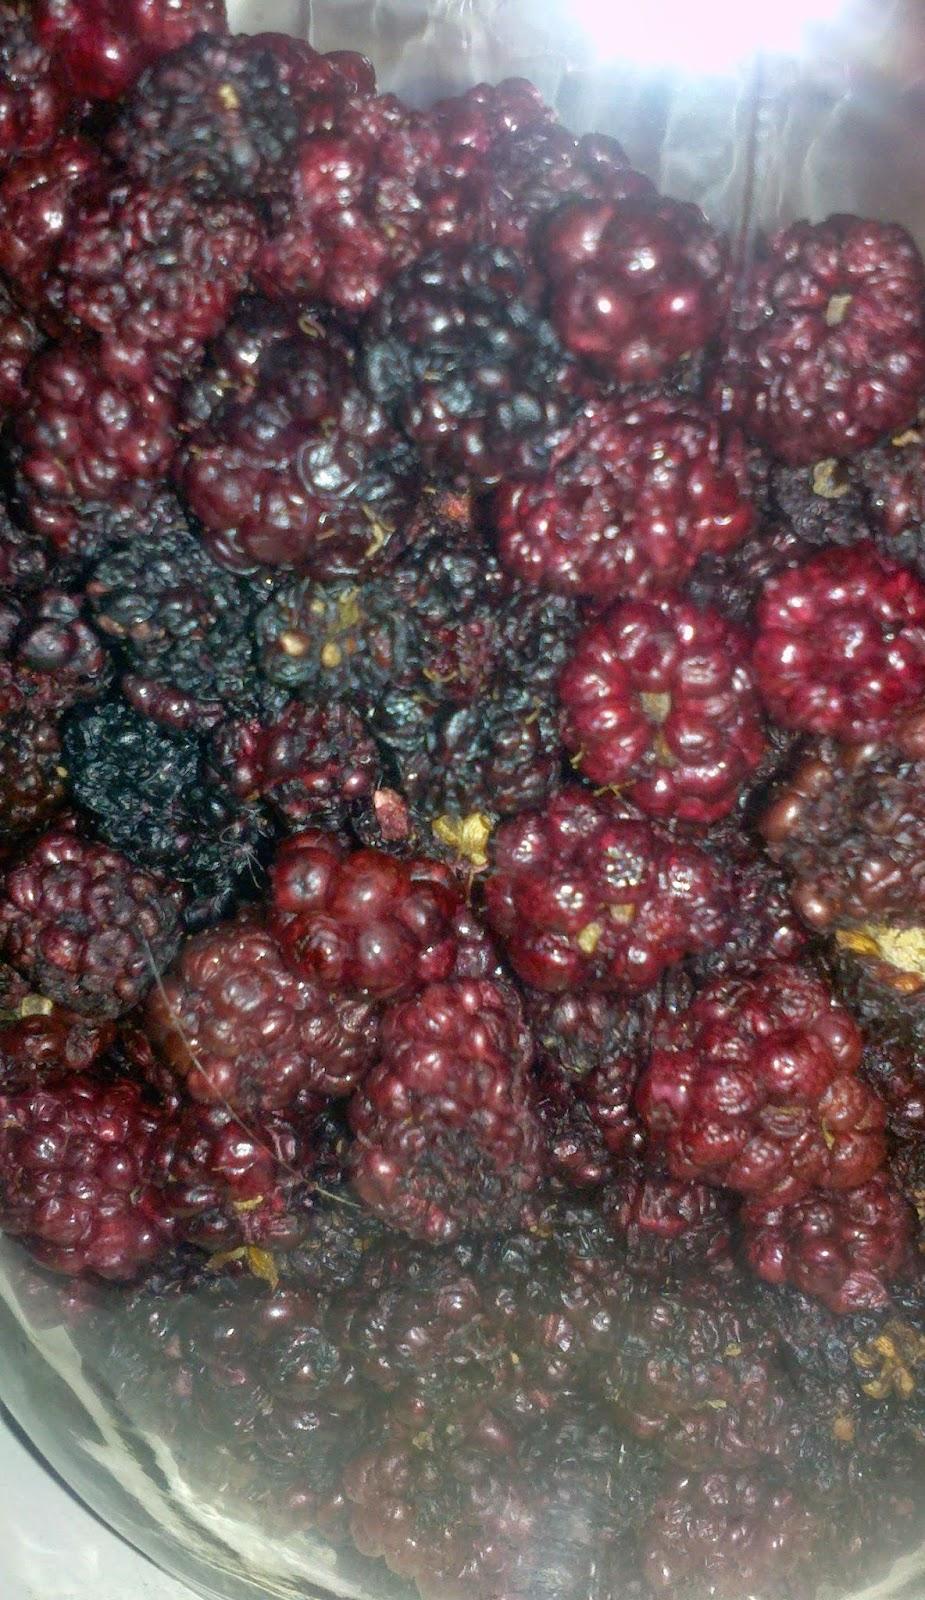 drying blackberries, how to preserve your blackberry harvest, dehydrating blackberries,